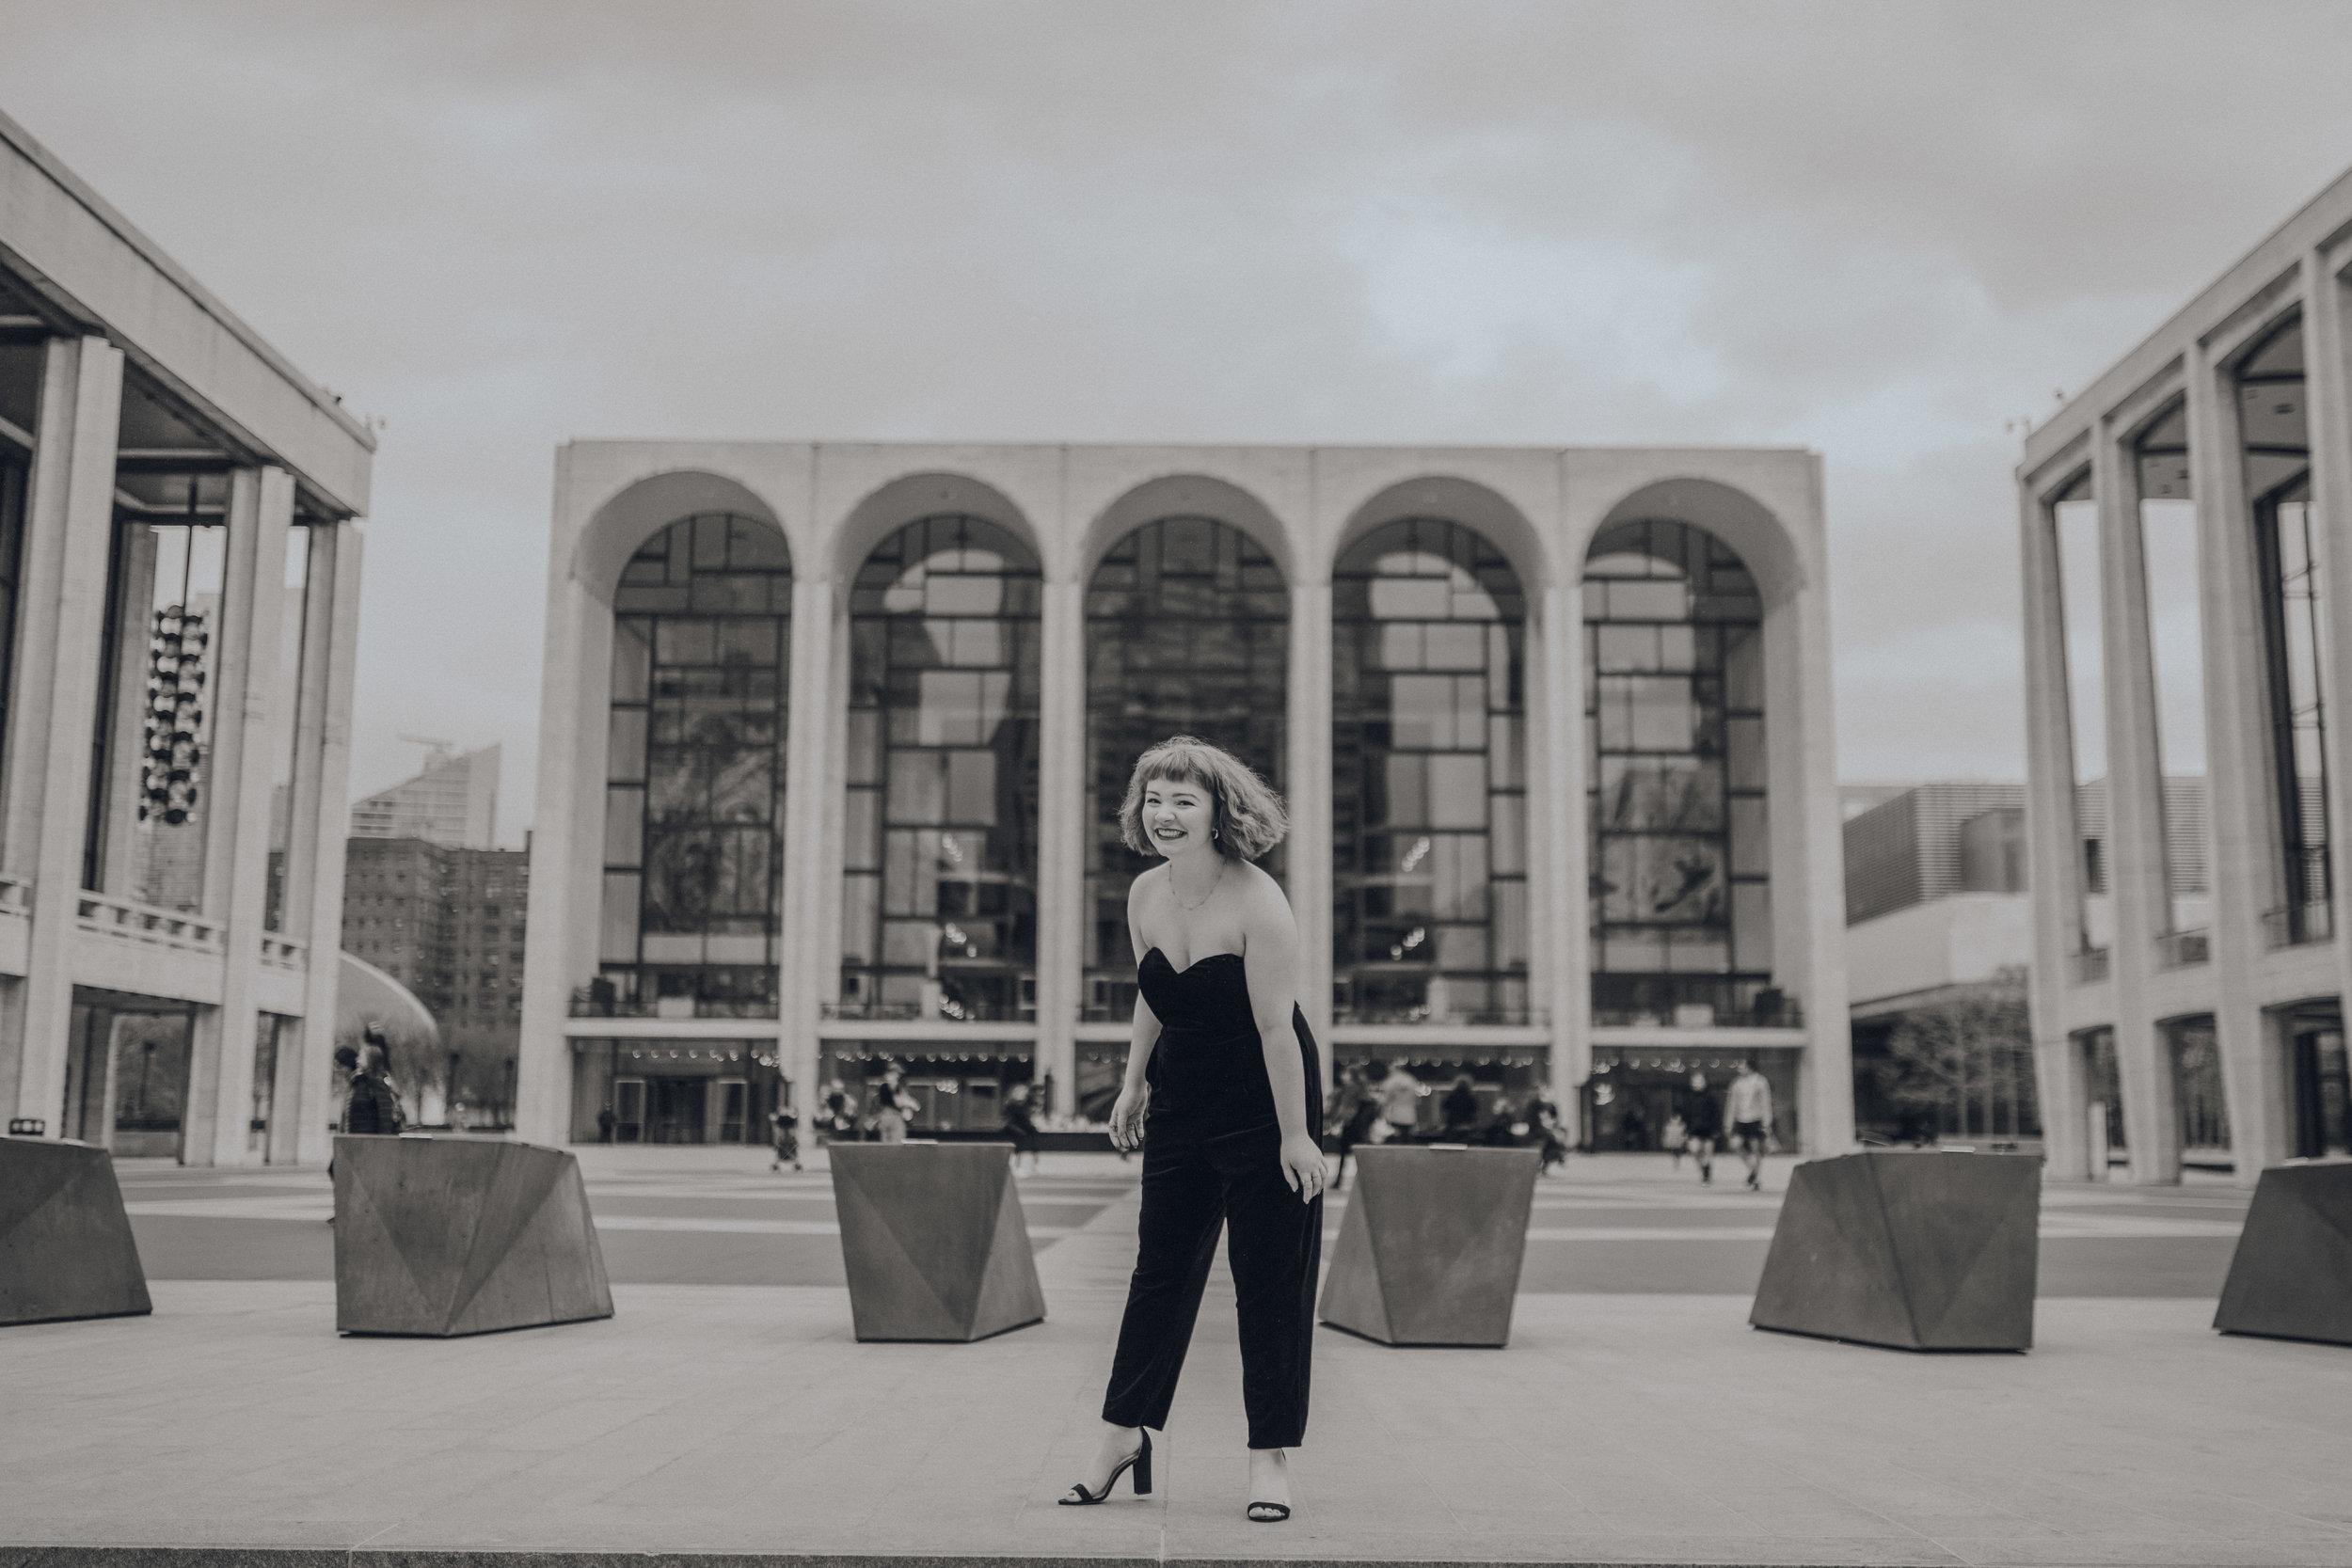 new_york_city_graduation_photographer (21 of 26).jpg